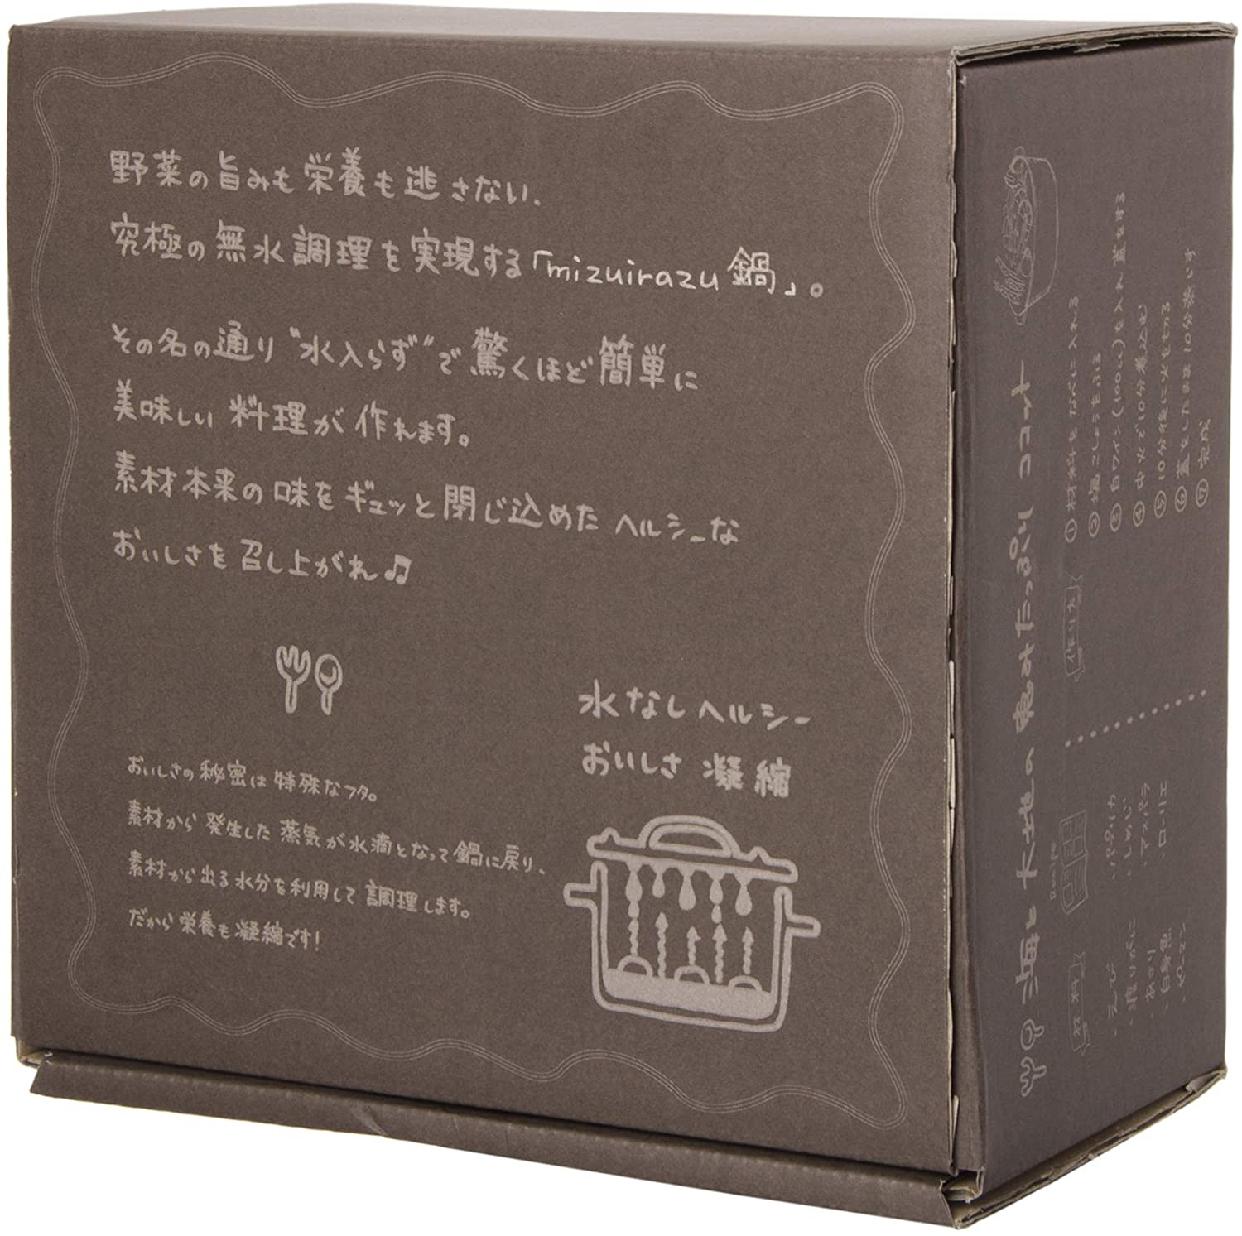 APEX HEART(アペックスハート) Mizuirazu鍋 MZ-1217の商品画像8